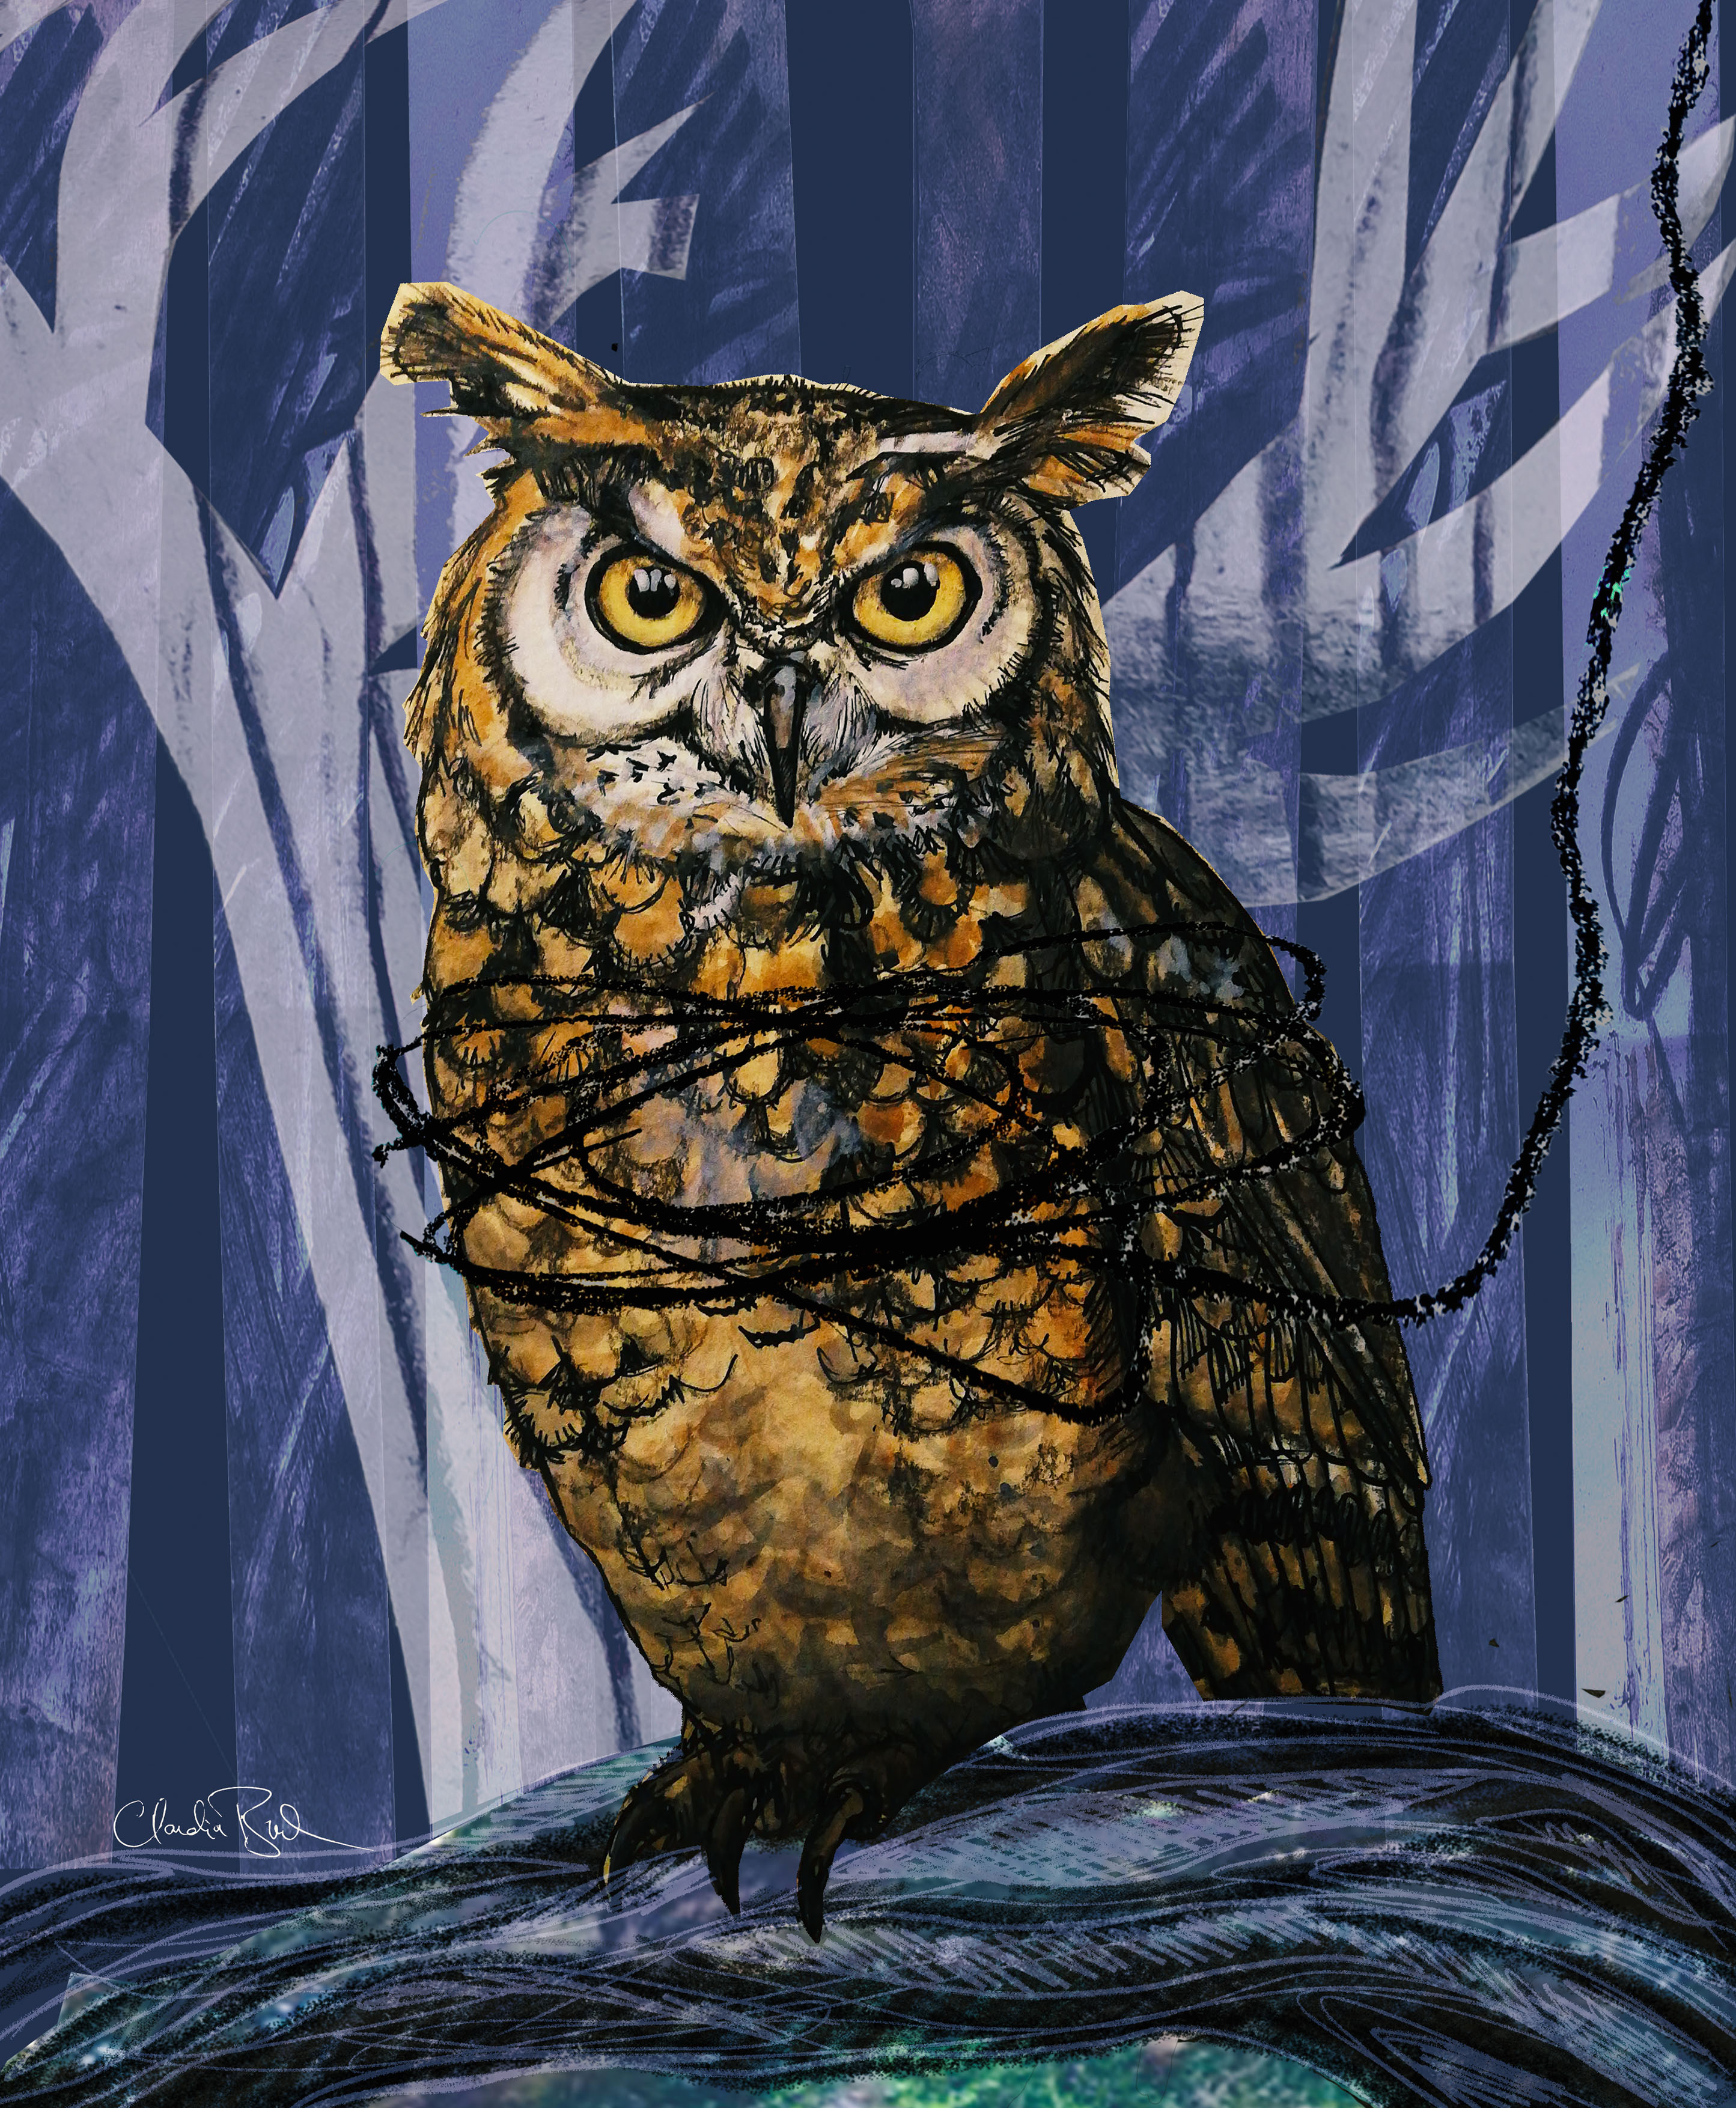 CBucek_OWL-small